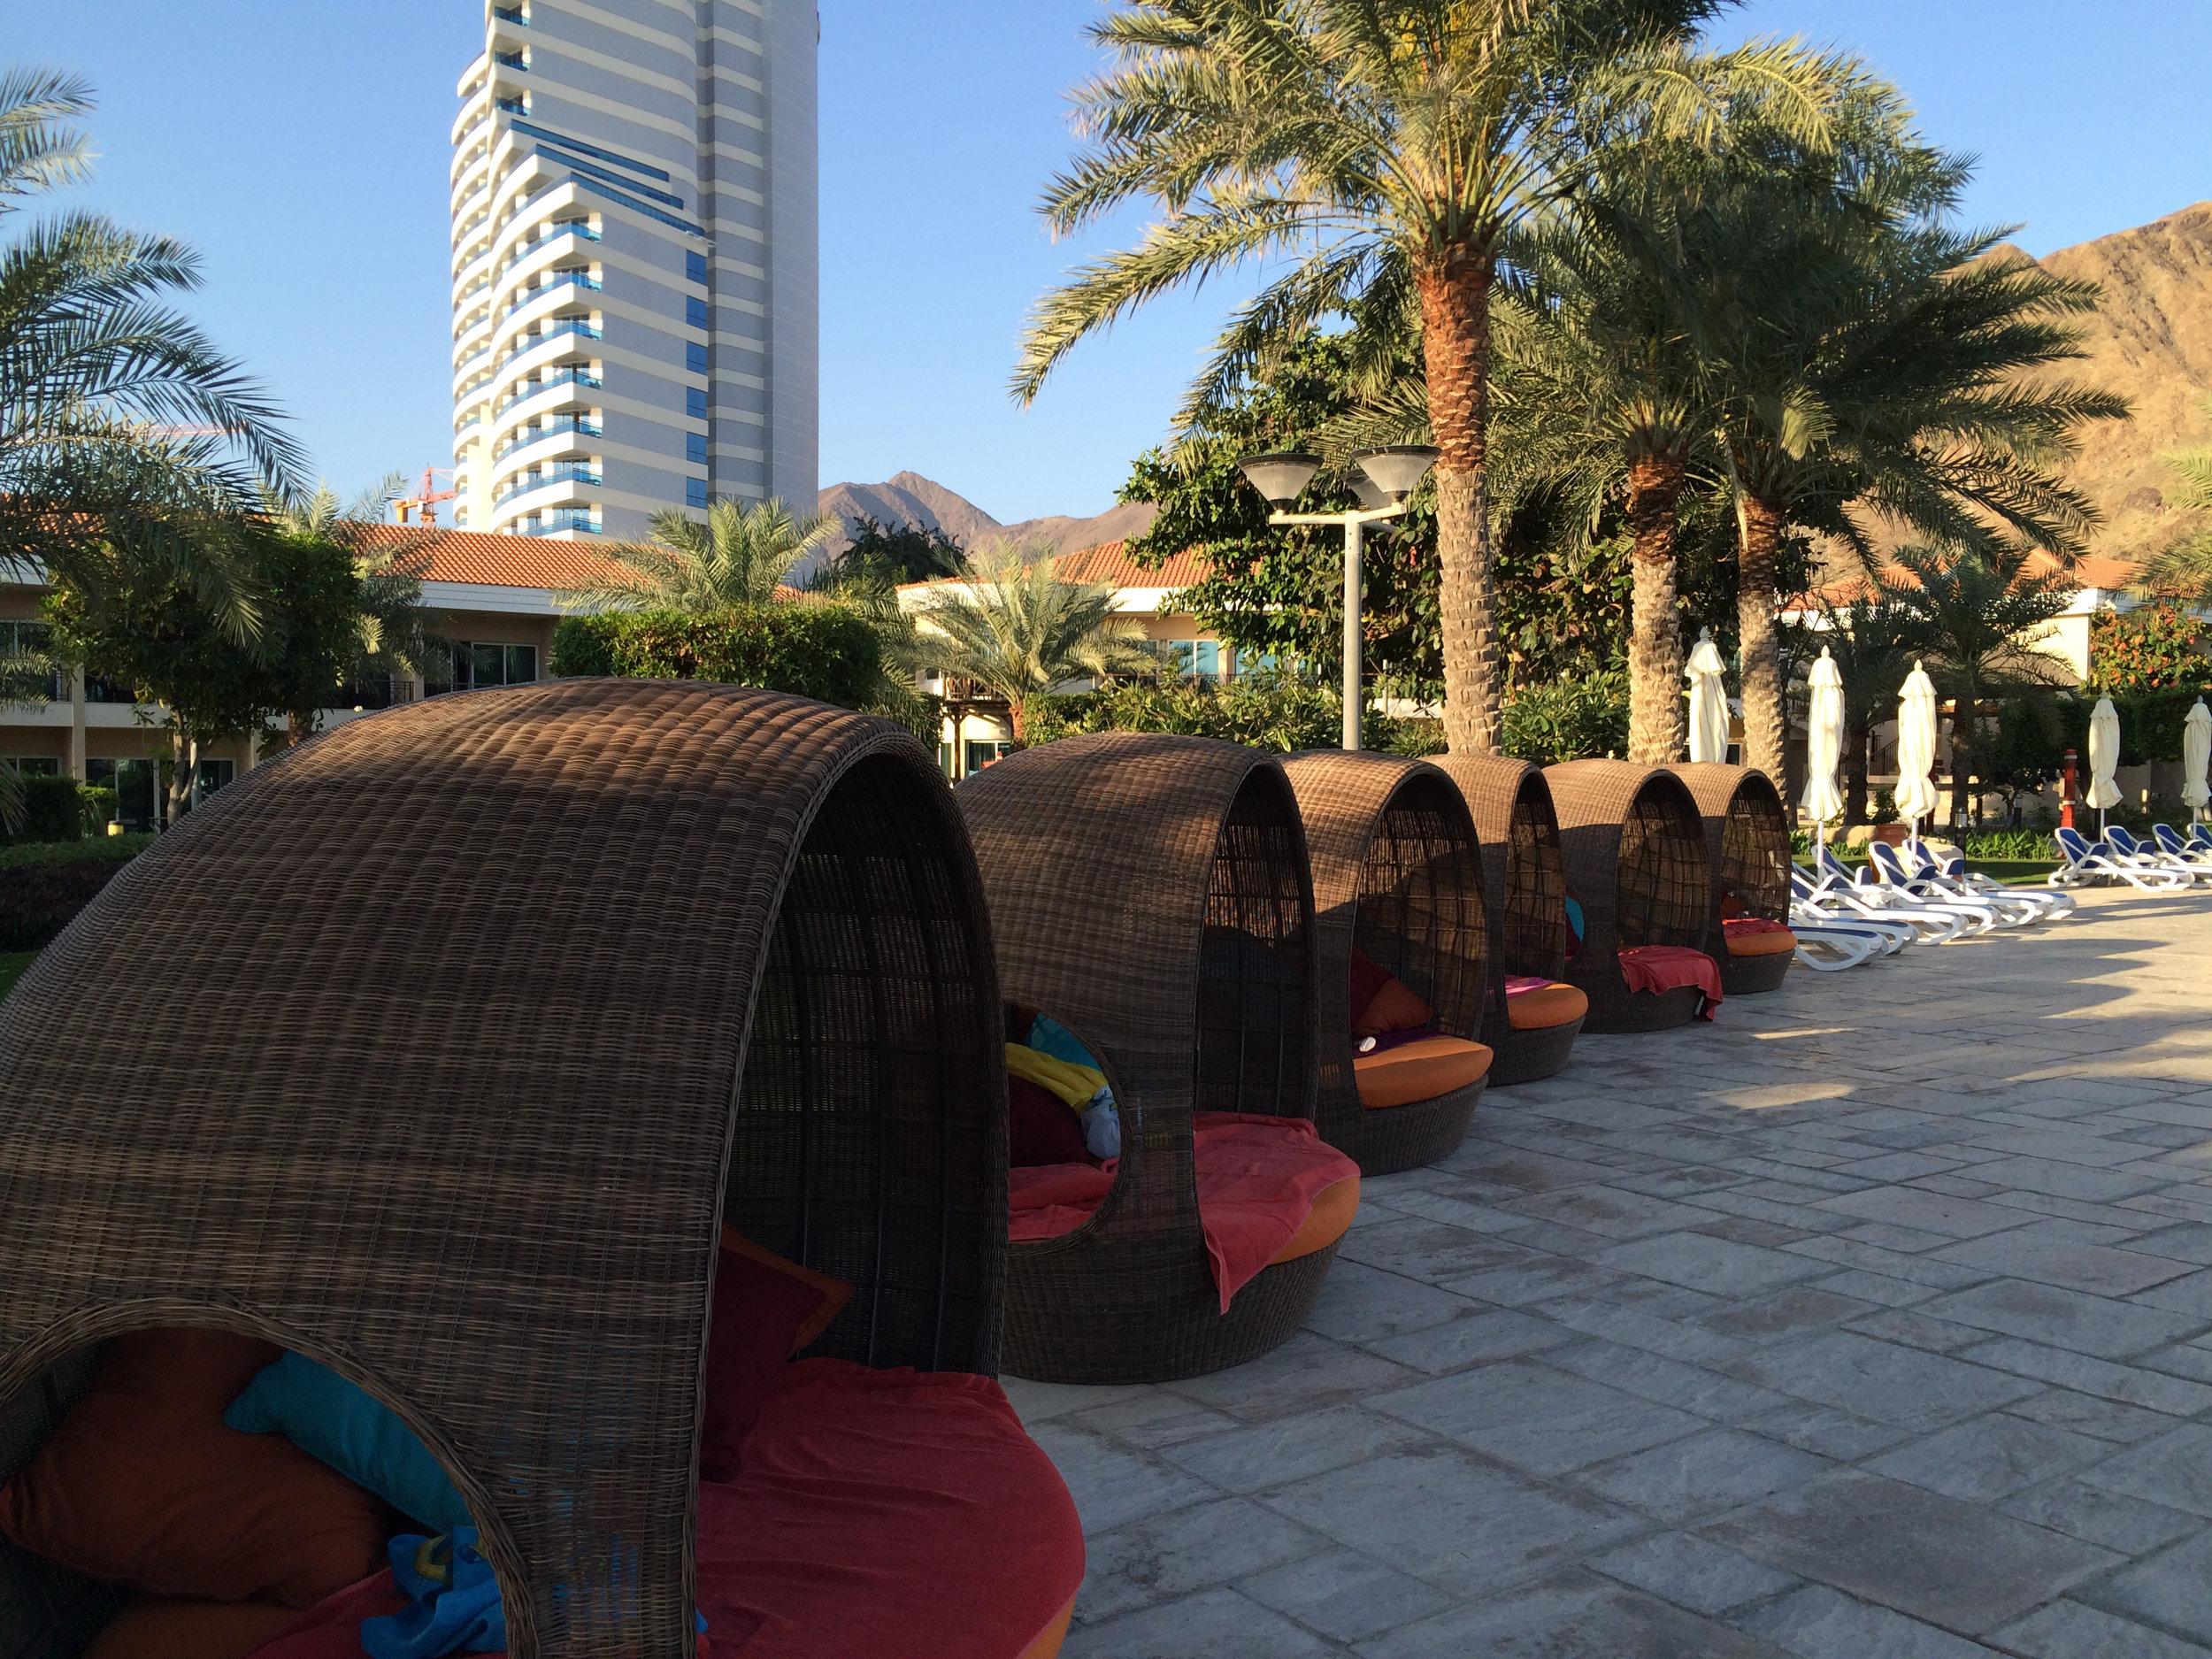 Luxurious pool at the Rotana Resort in  Fujairah, UAE